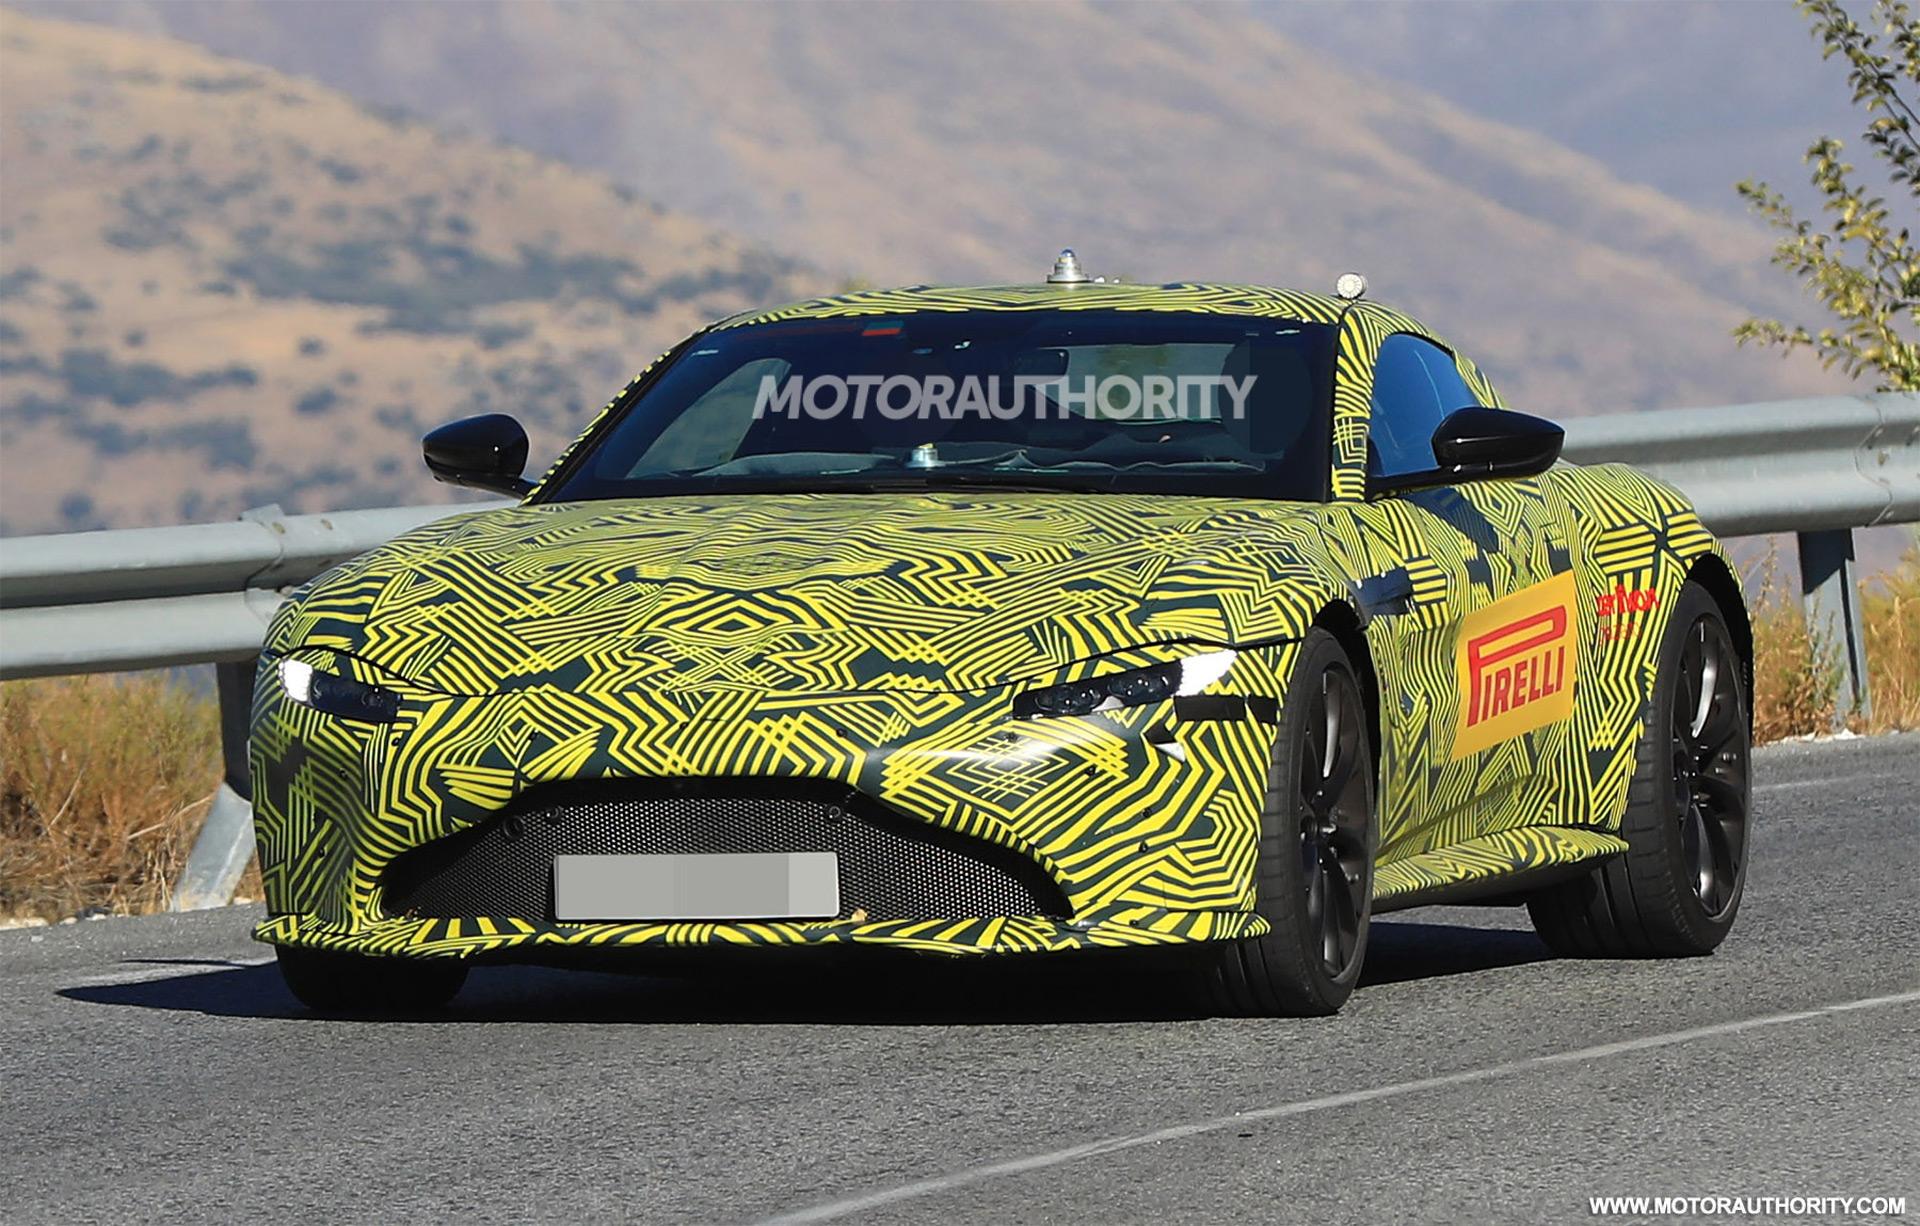 Bmw 3 2018 >> 2018 Aston Martin Vantage spy shots and video